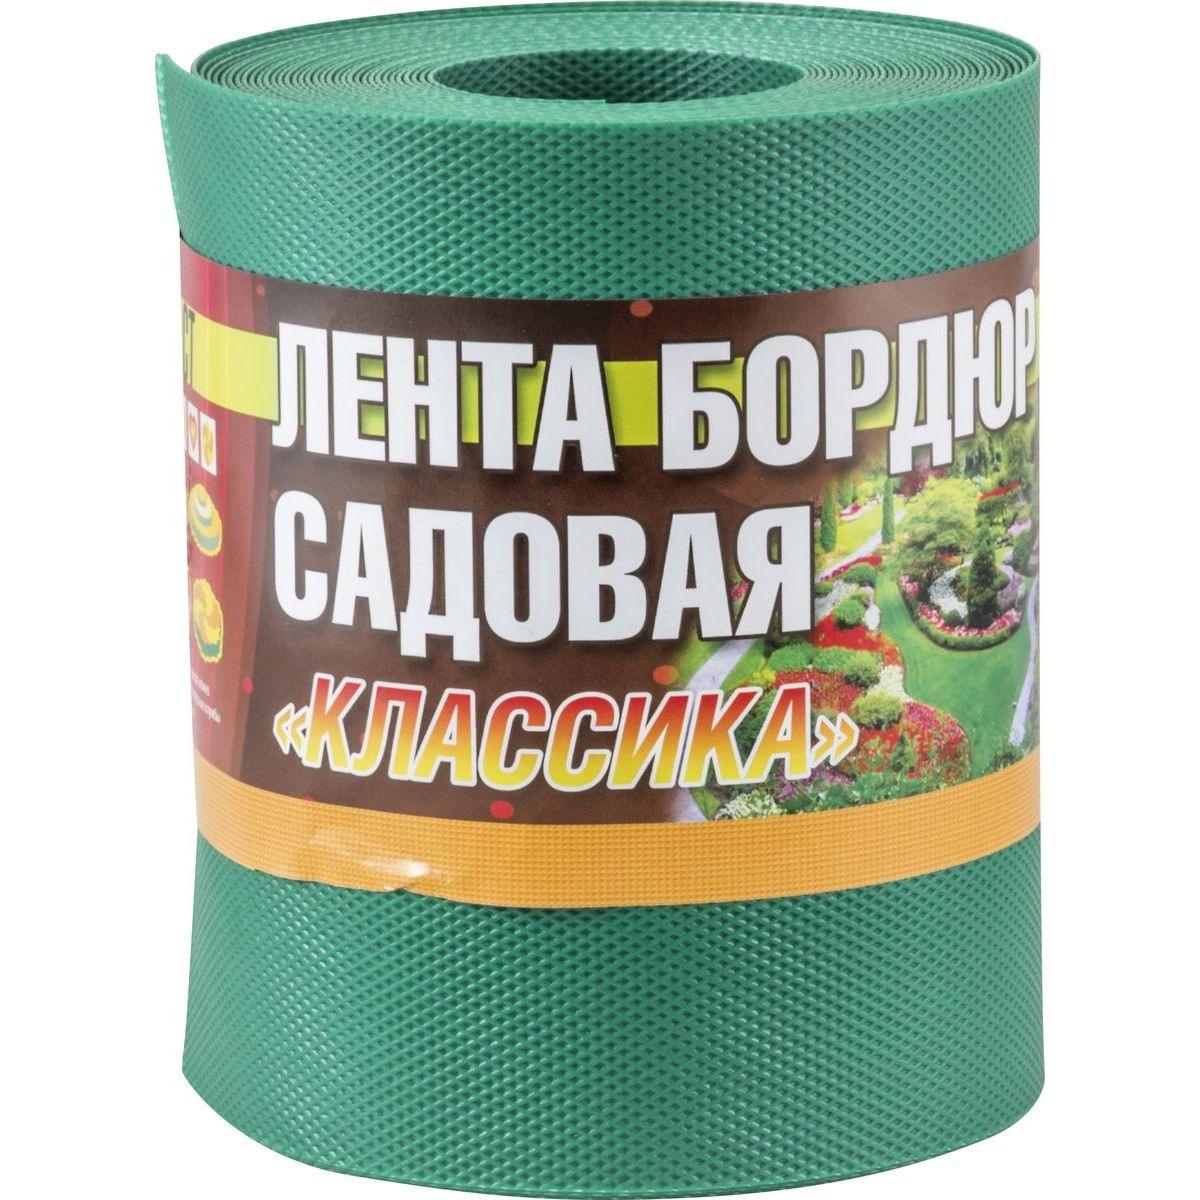 Лента бордюрная Эко-Пласт Классика, ЭКО37ПС, зеленый, 15 см х 9 м